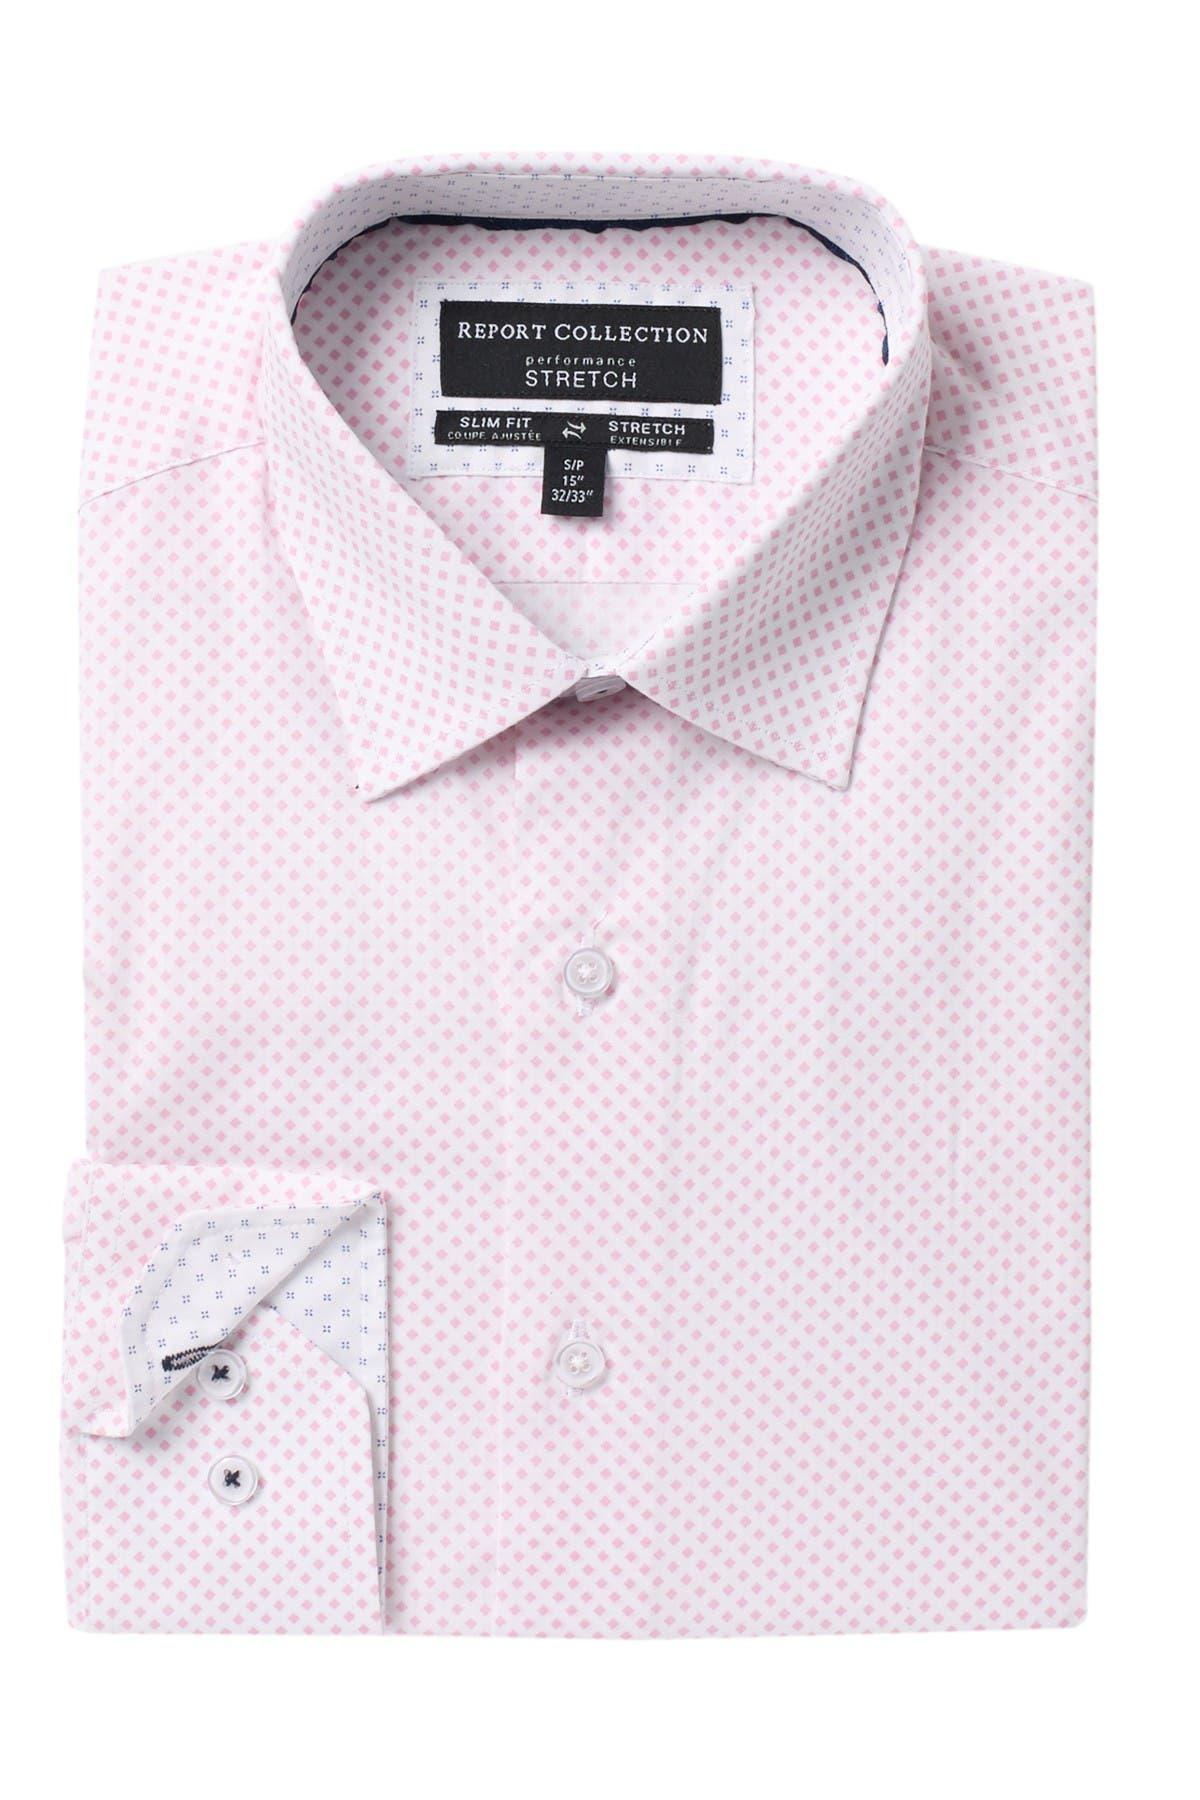 Image of Report Collection Slim Fit Diamond Print Dress Shirt